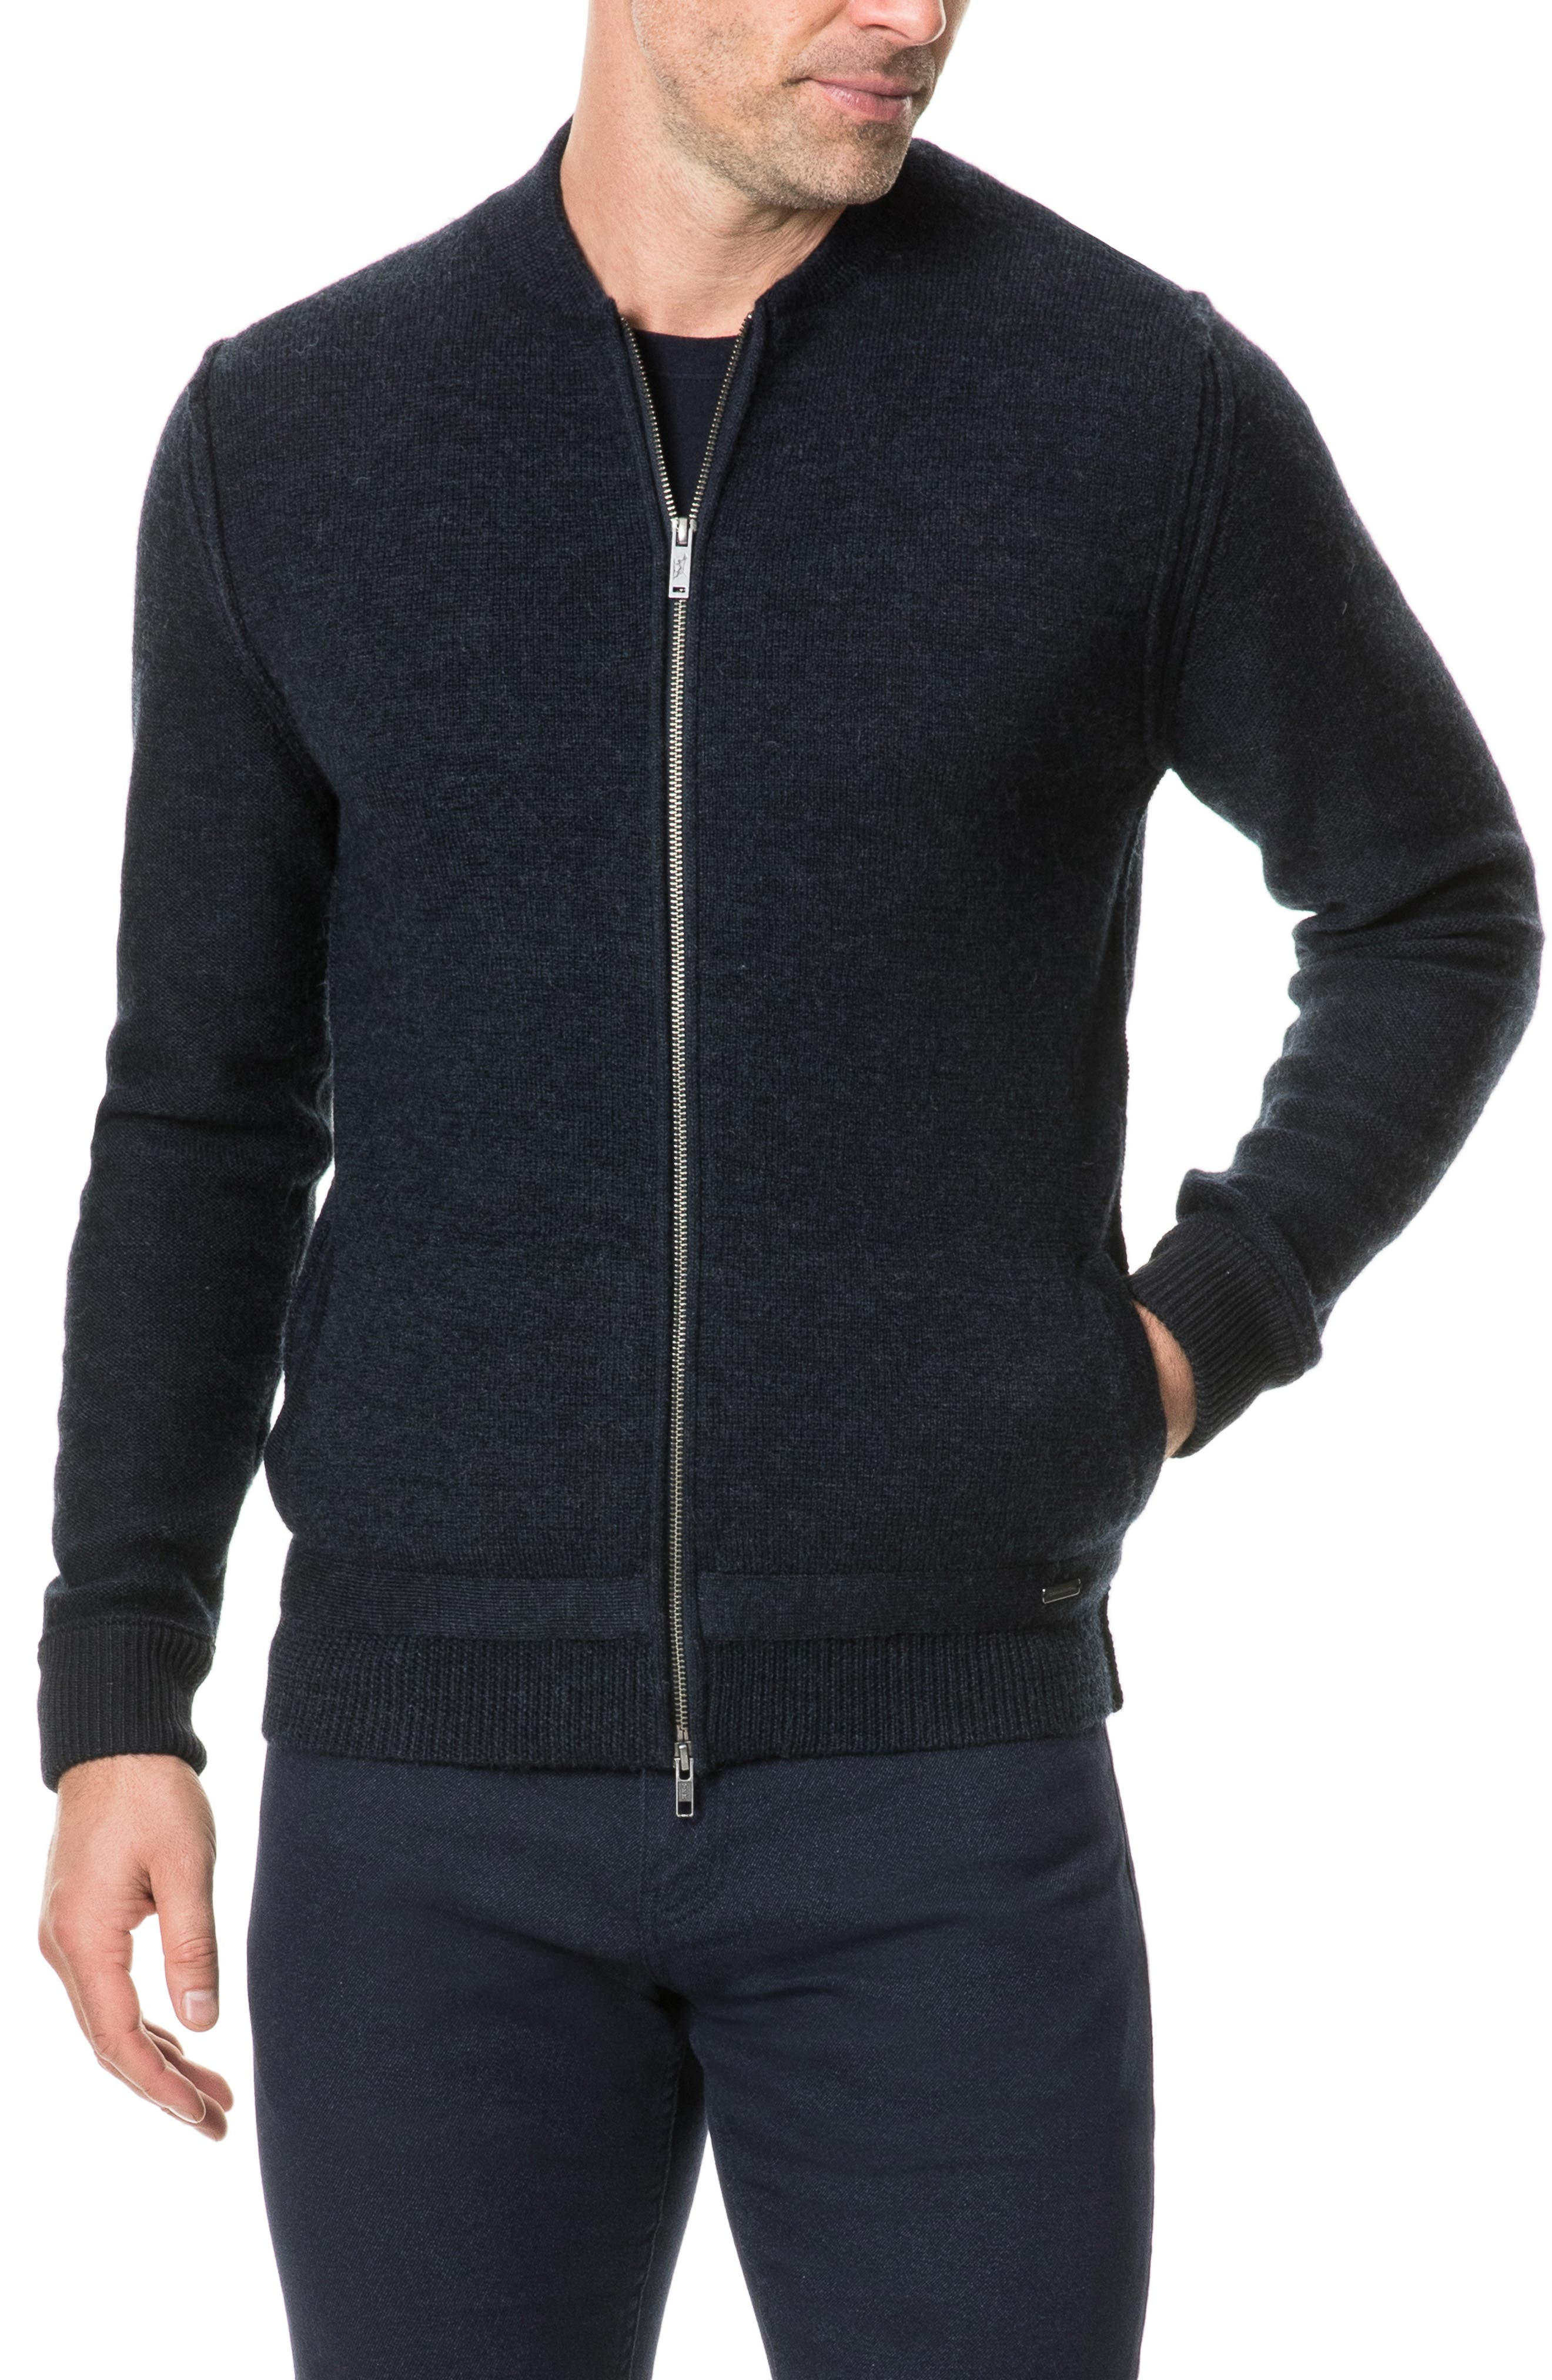 Fairton Regular Fit Wool Zip Front Sweater,                             Main thumbnail 1, color,                             NAVY